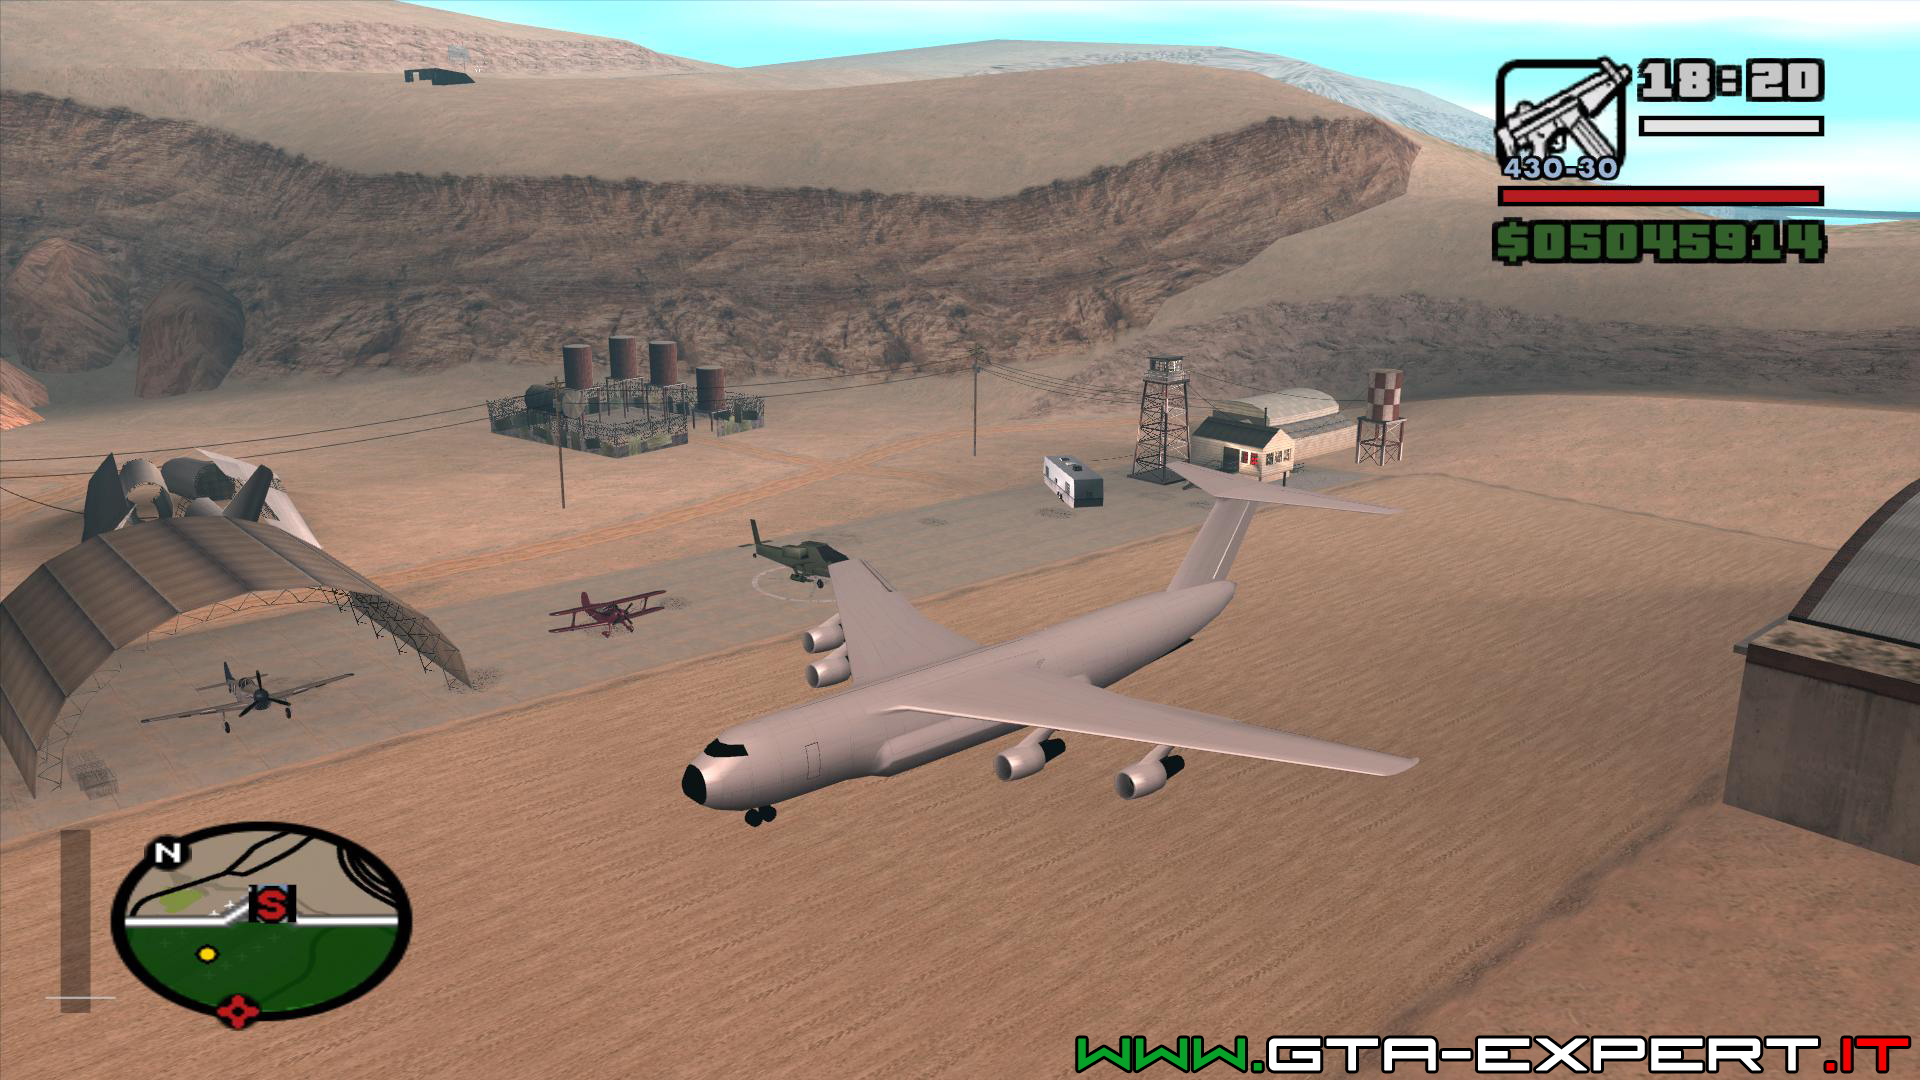 Aereo Da Caccia Gta 5 : Elicotteri e aerei gta san andreas expert